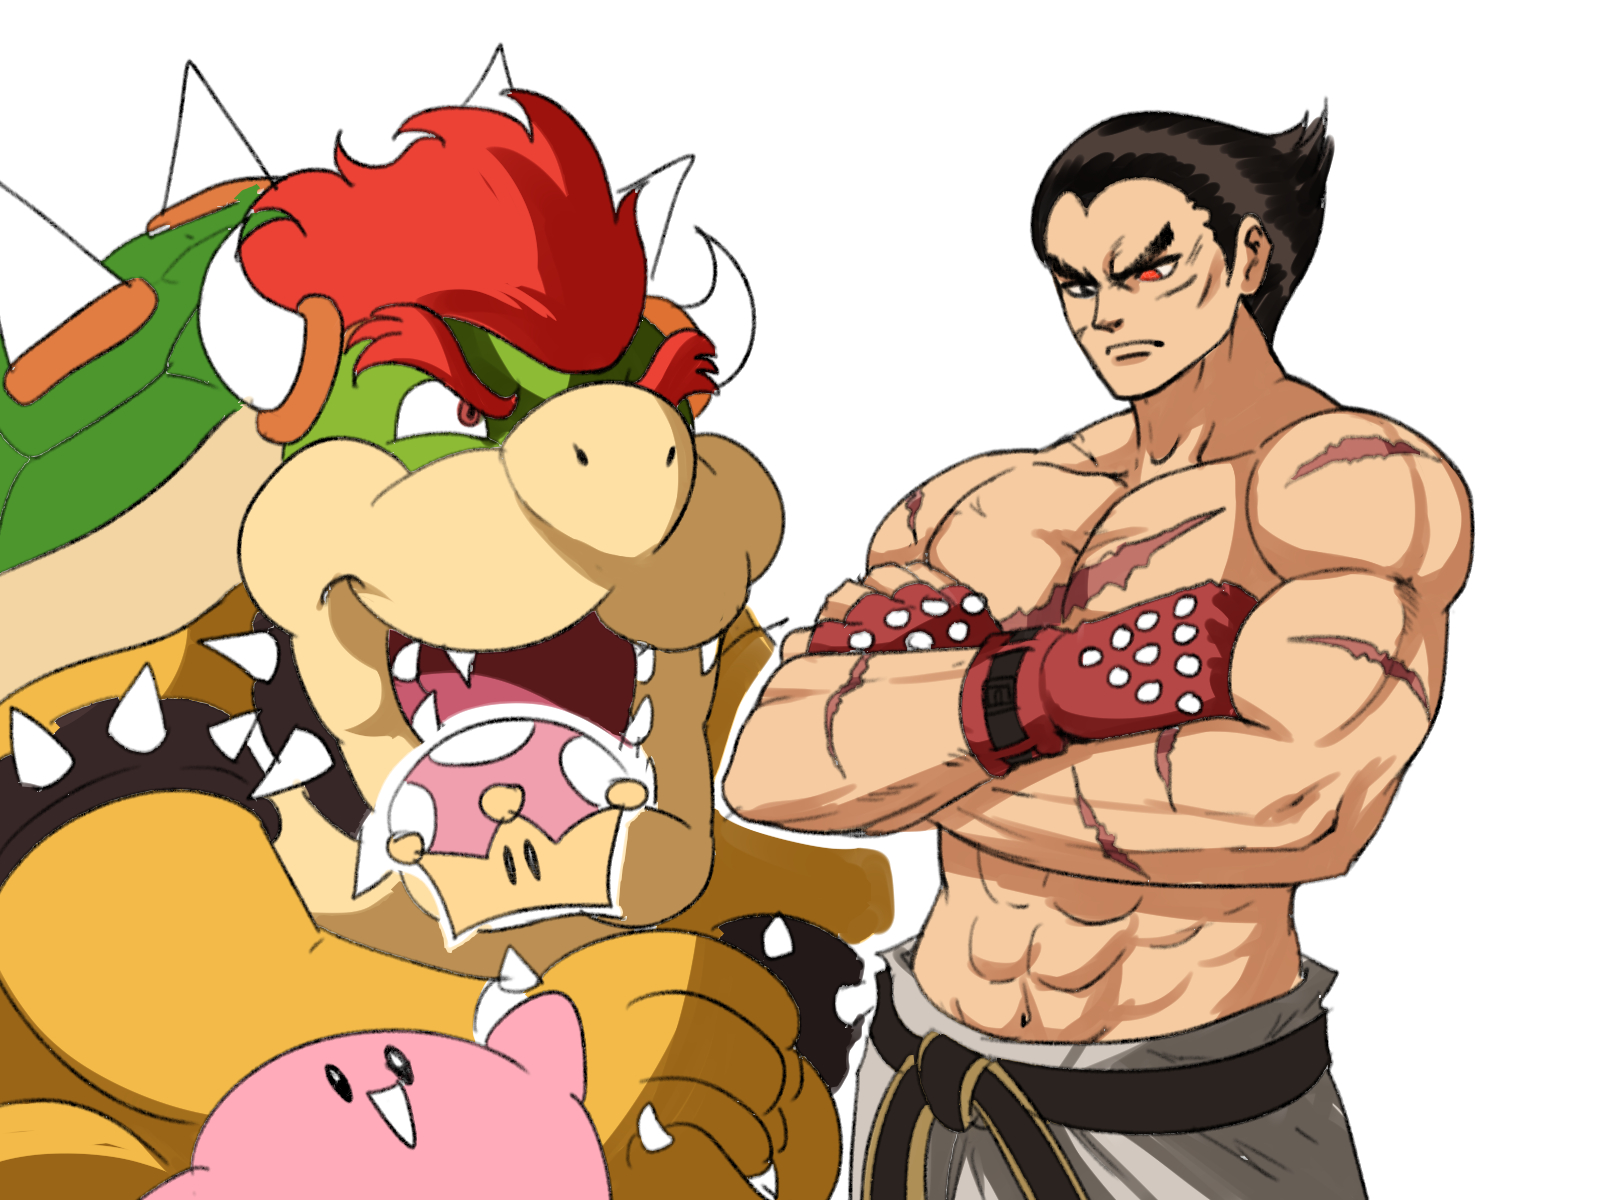 Kazuya Fem Super Smash Bros Ultimate Tuna Fat